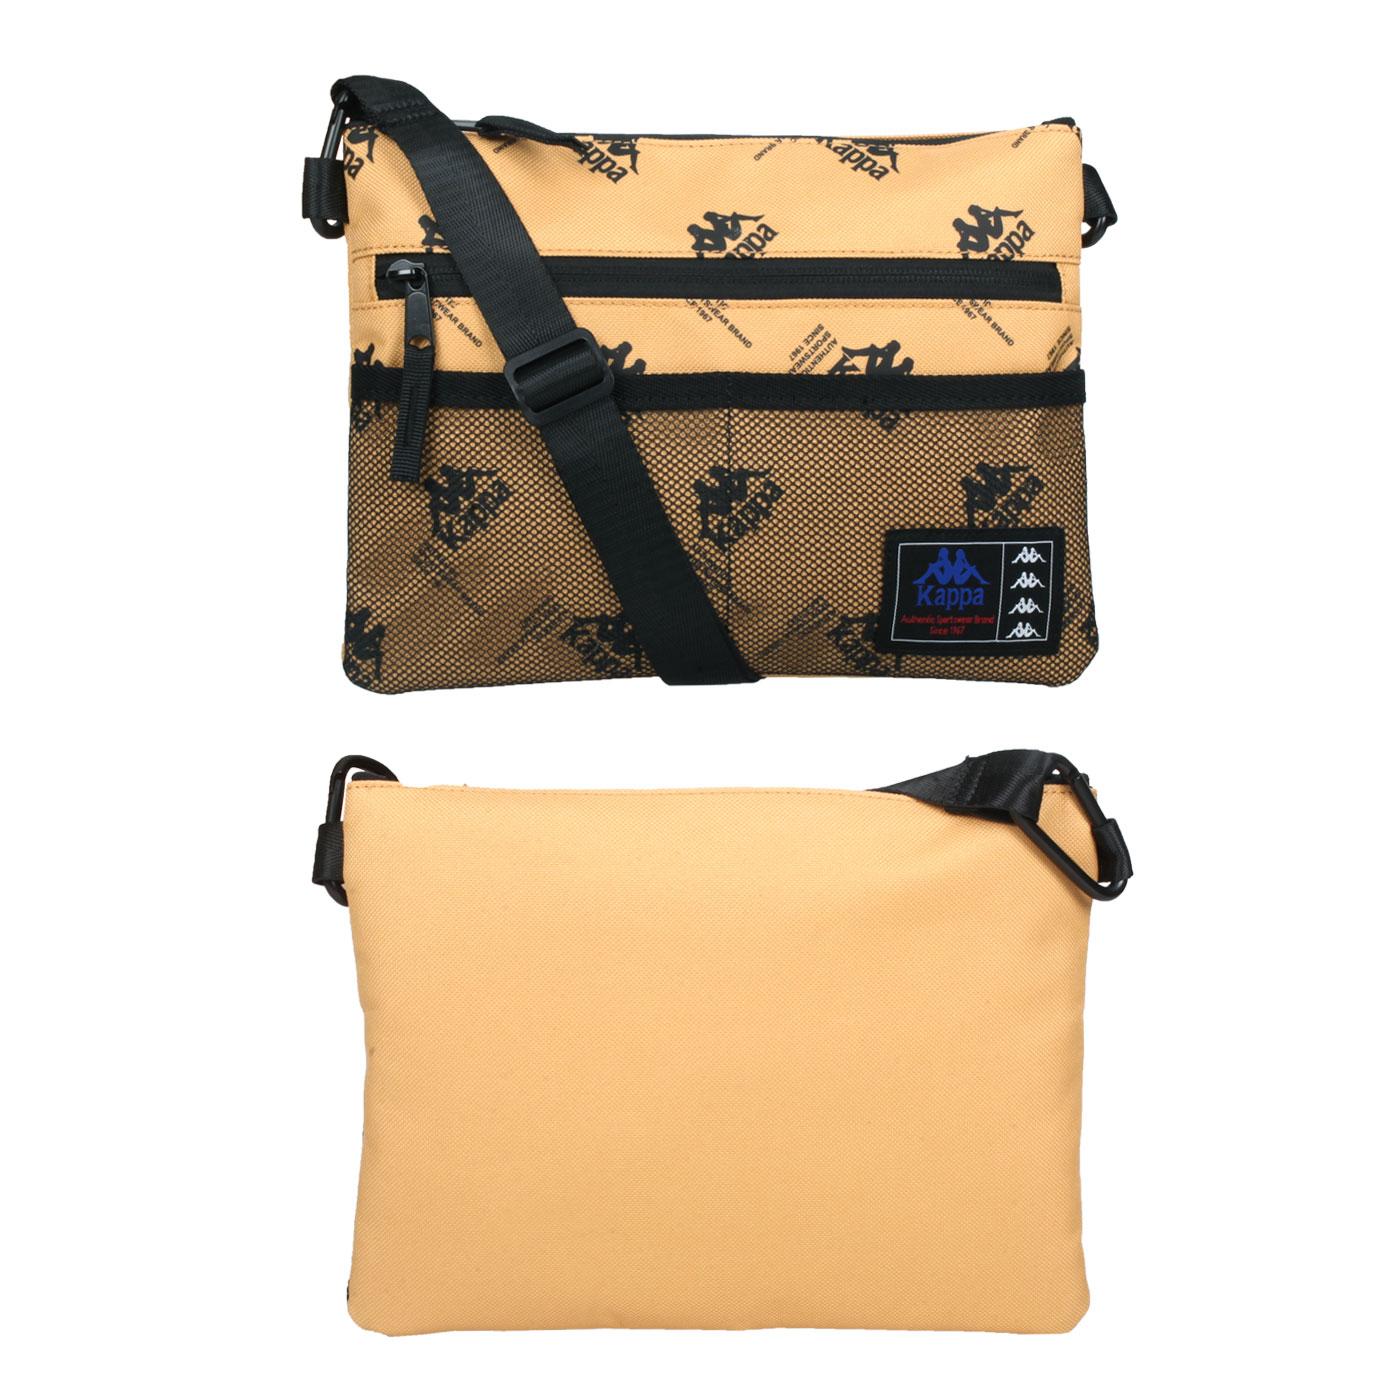 KAPPA 手拿包袋 35168KW-Z07 - 棕黑